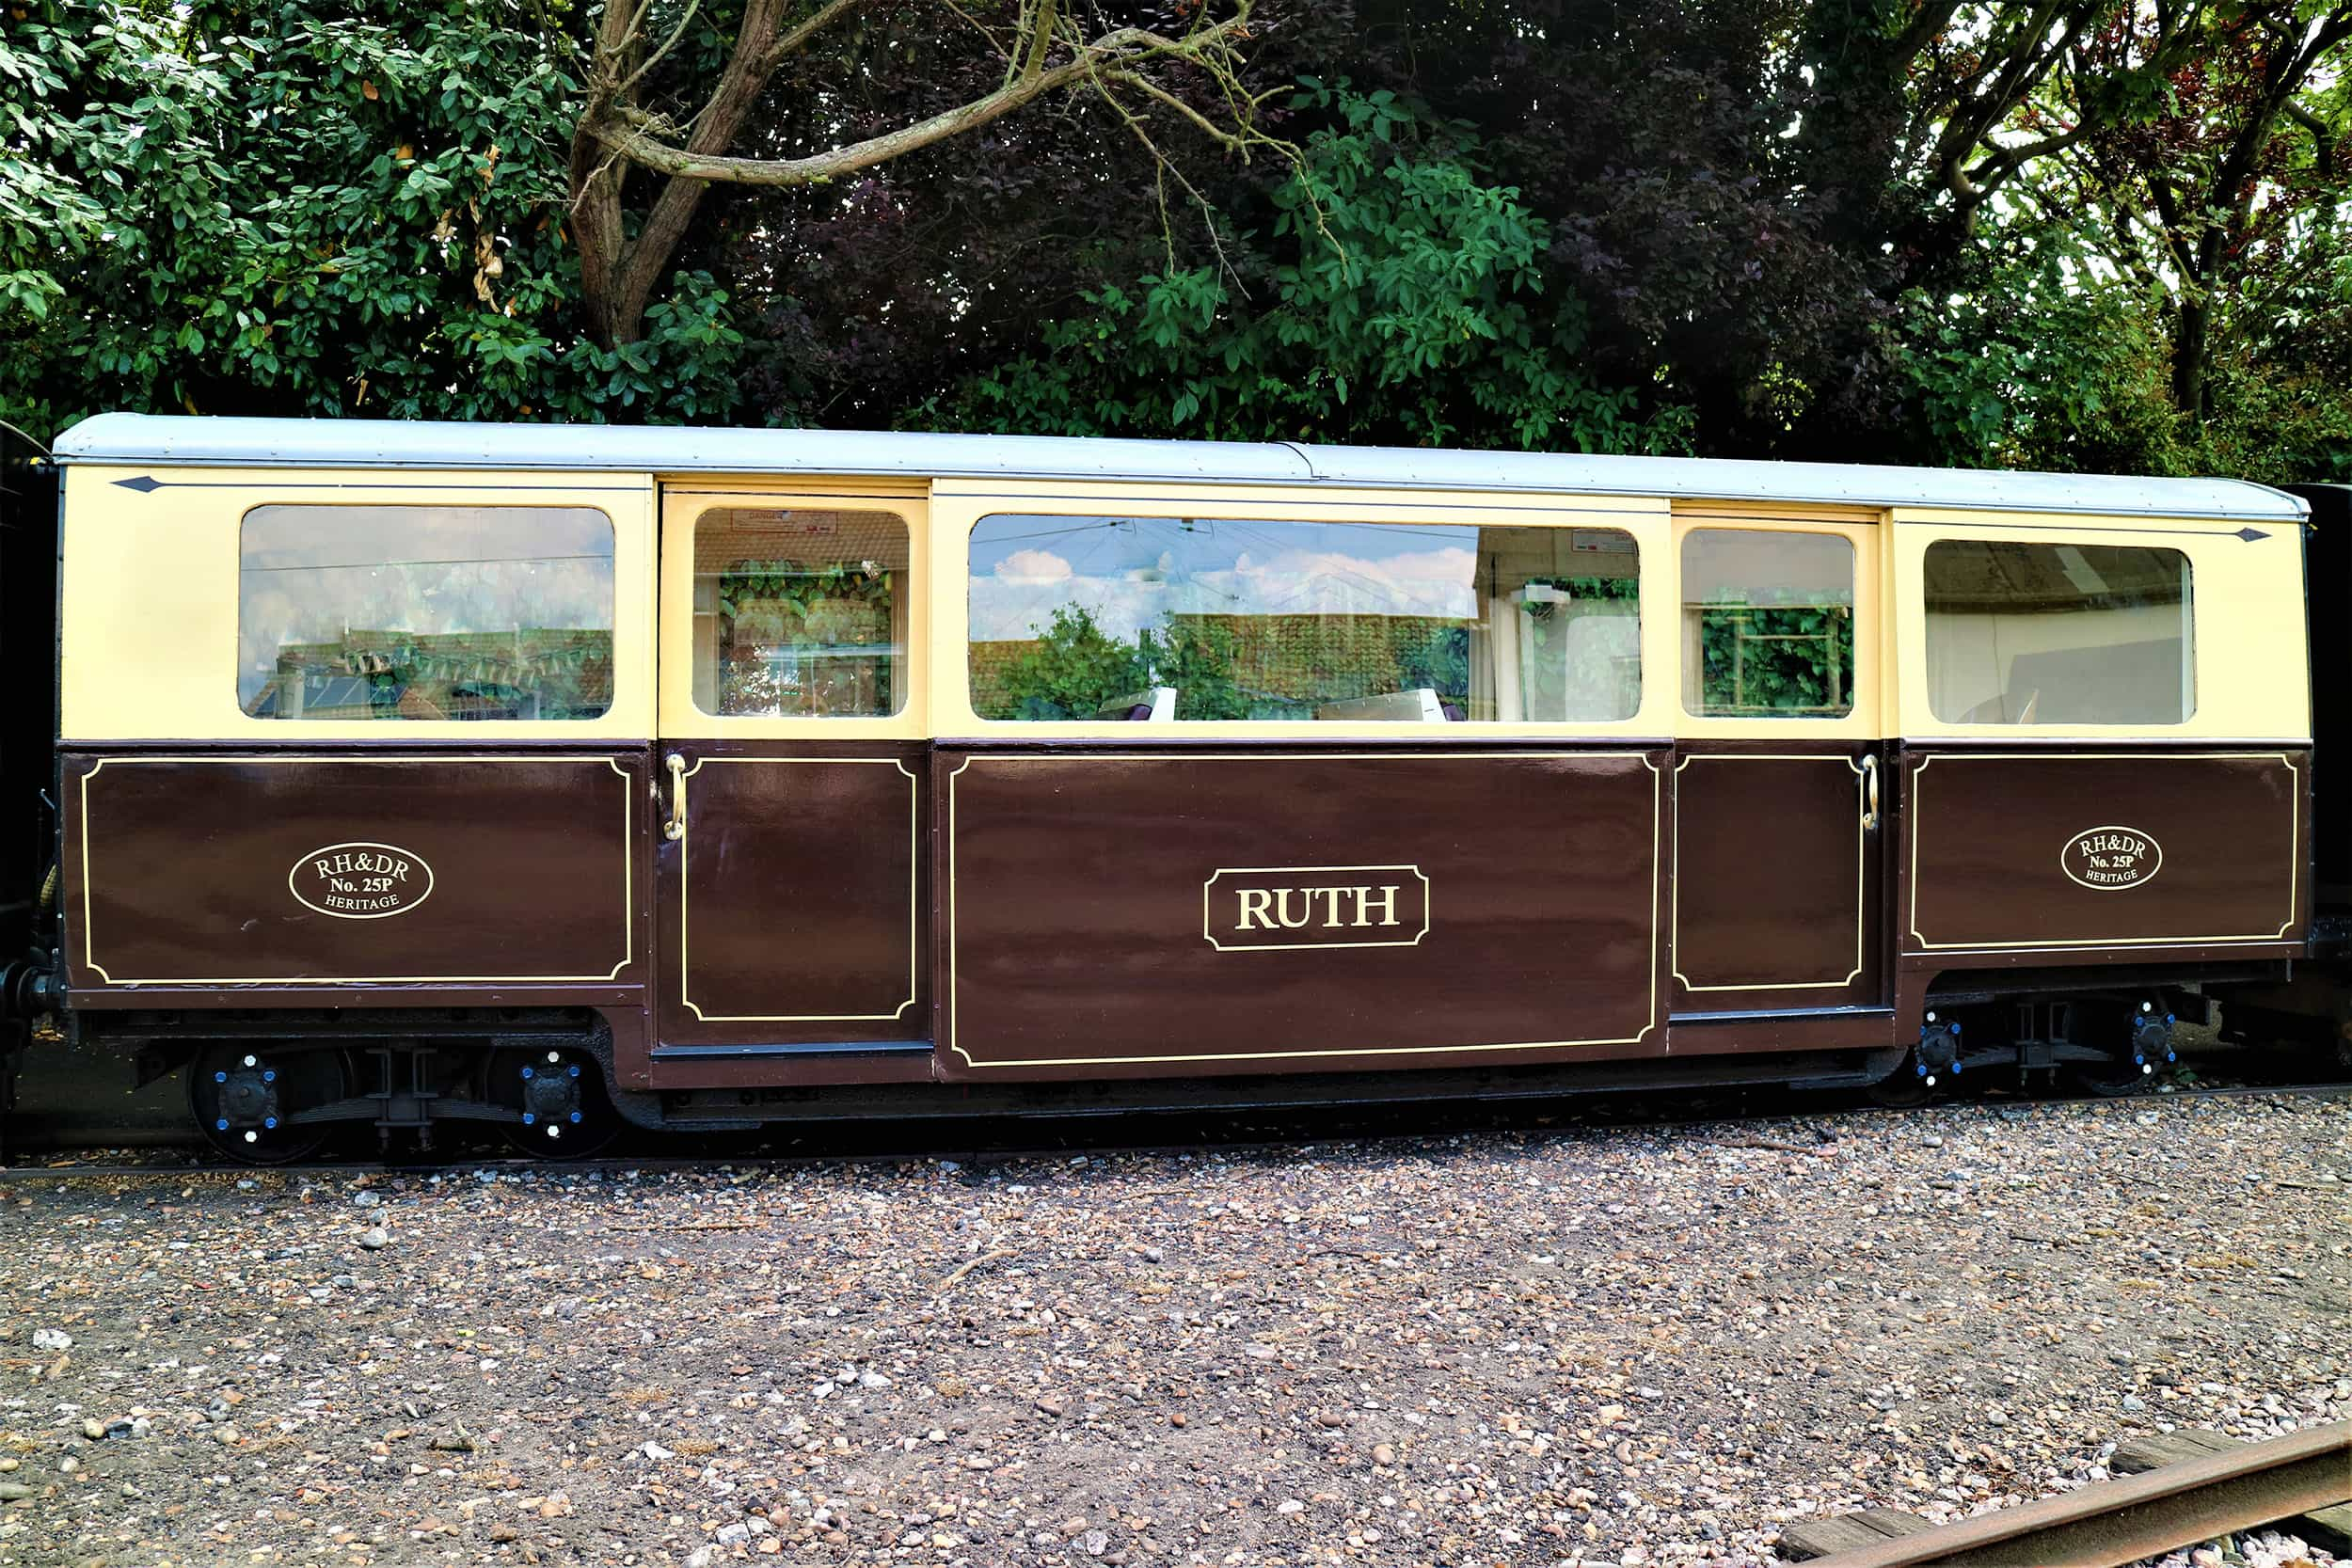 Heritage Carriage - Ruth - Romney, Hythe & Dymchurch Railway